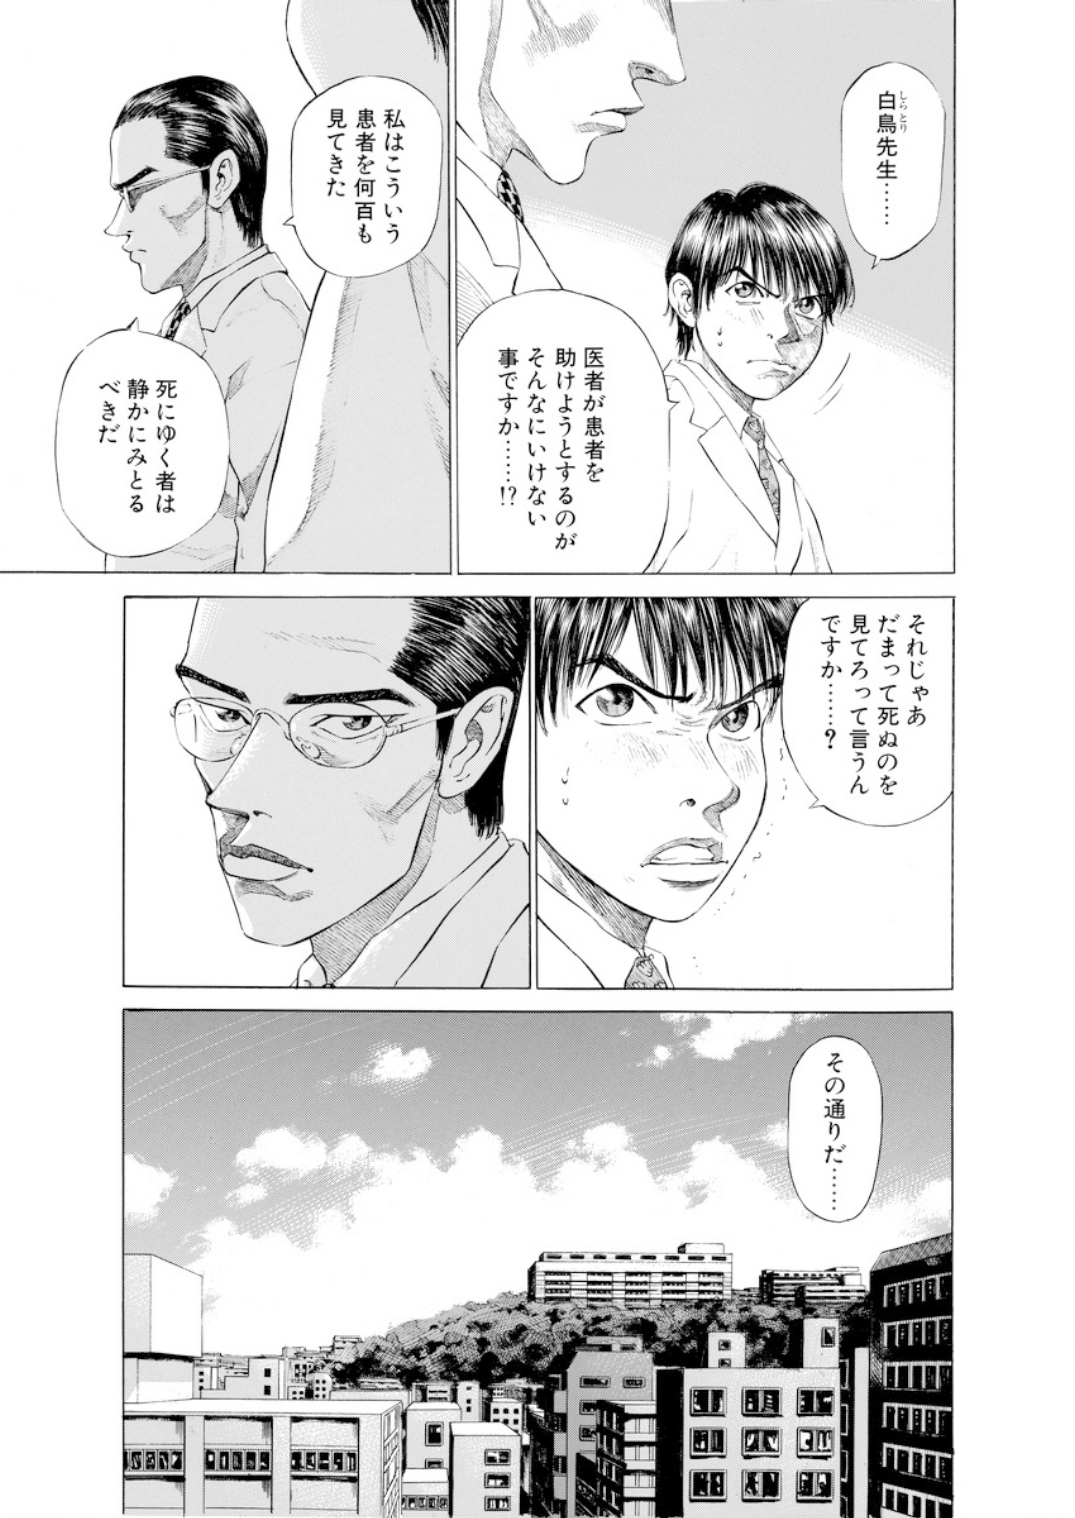 001bj_page-0115.jpg